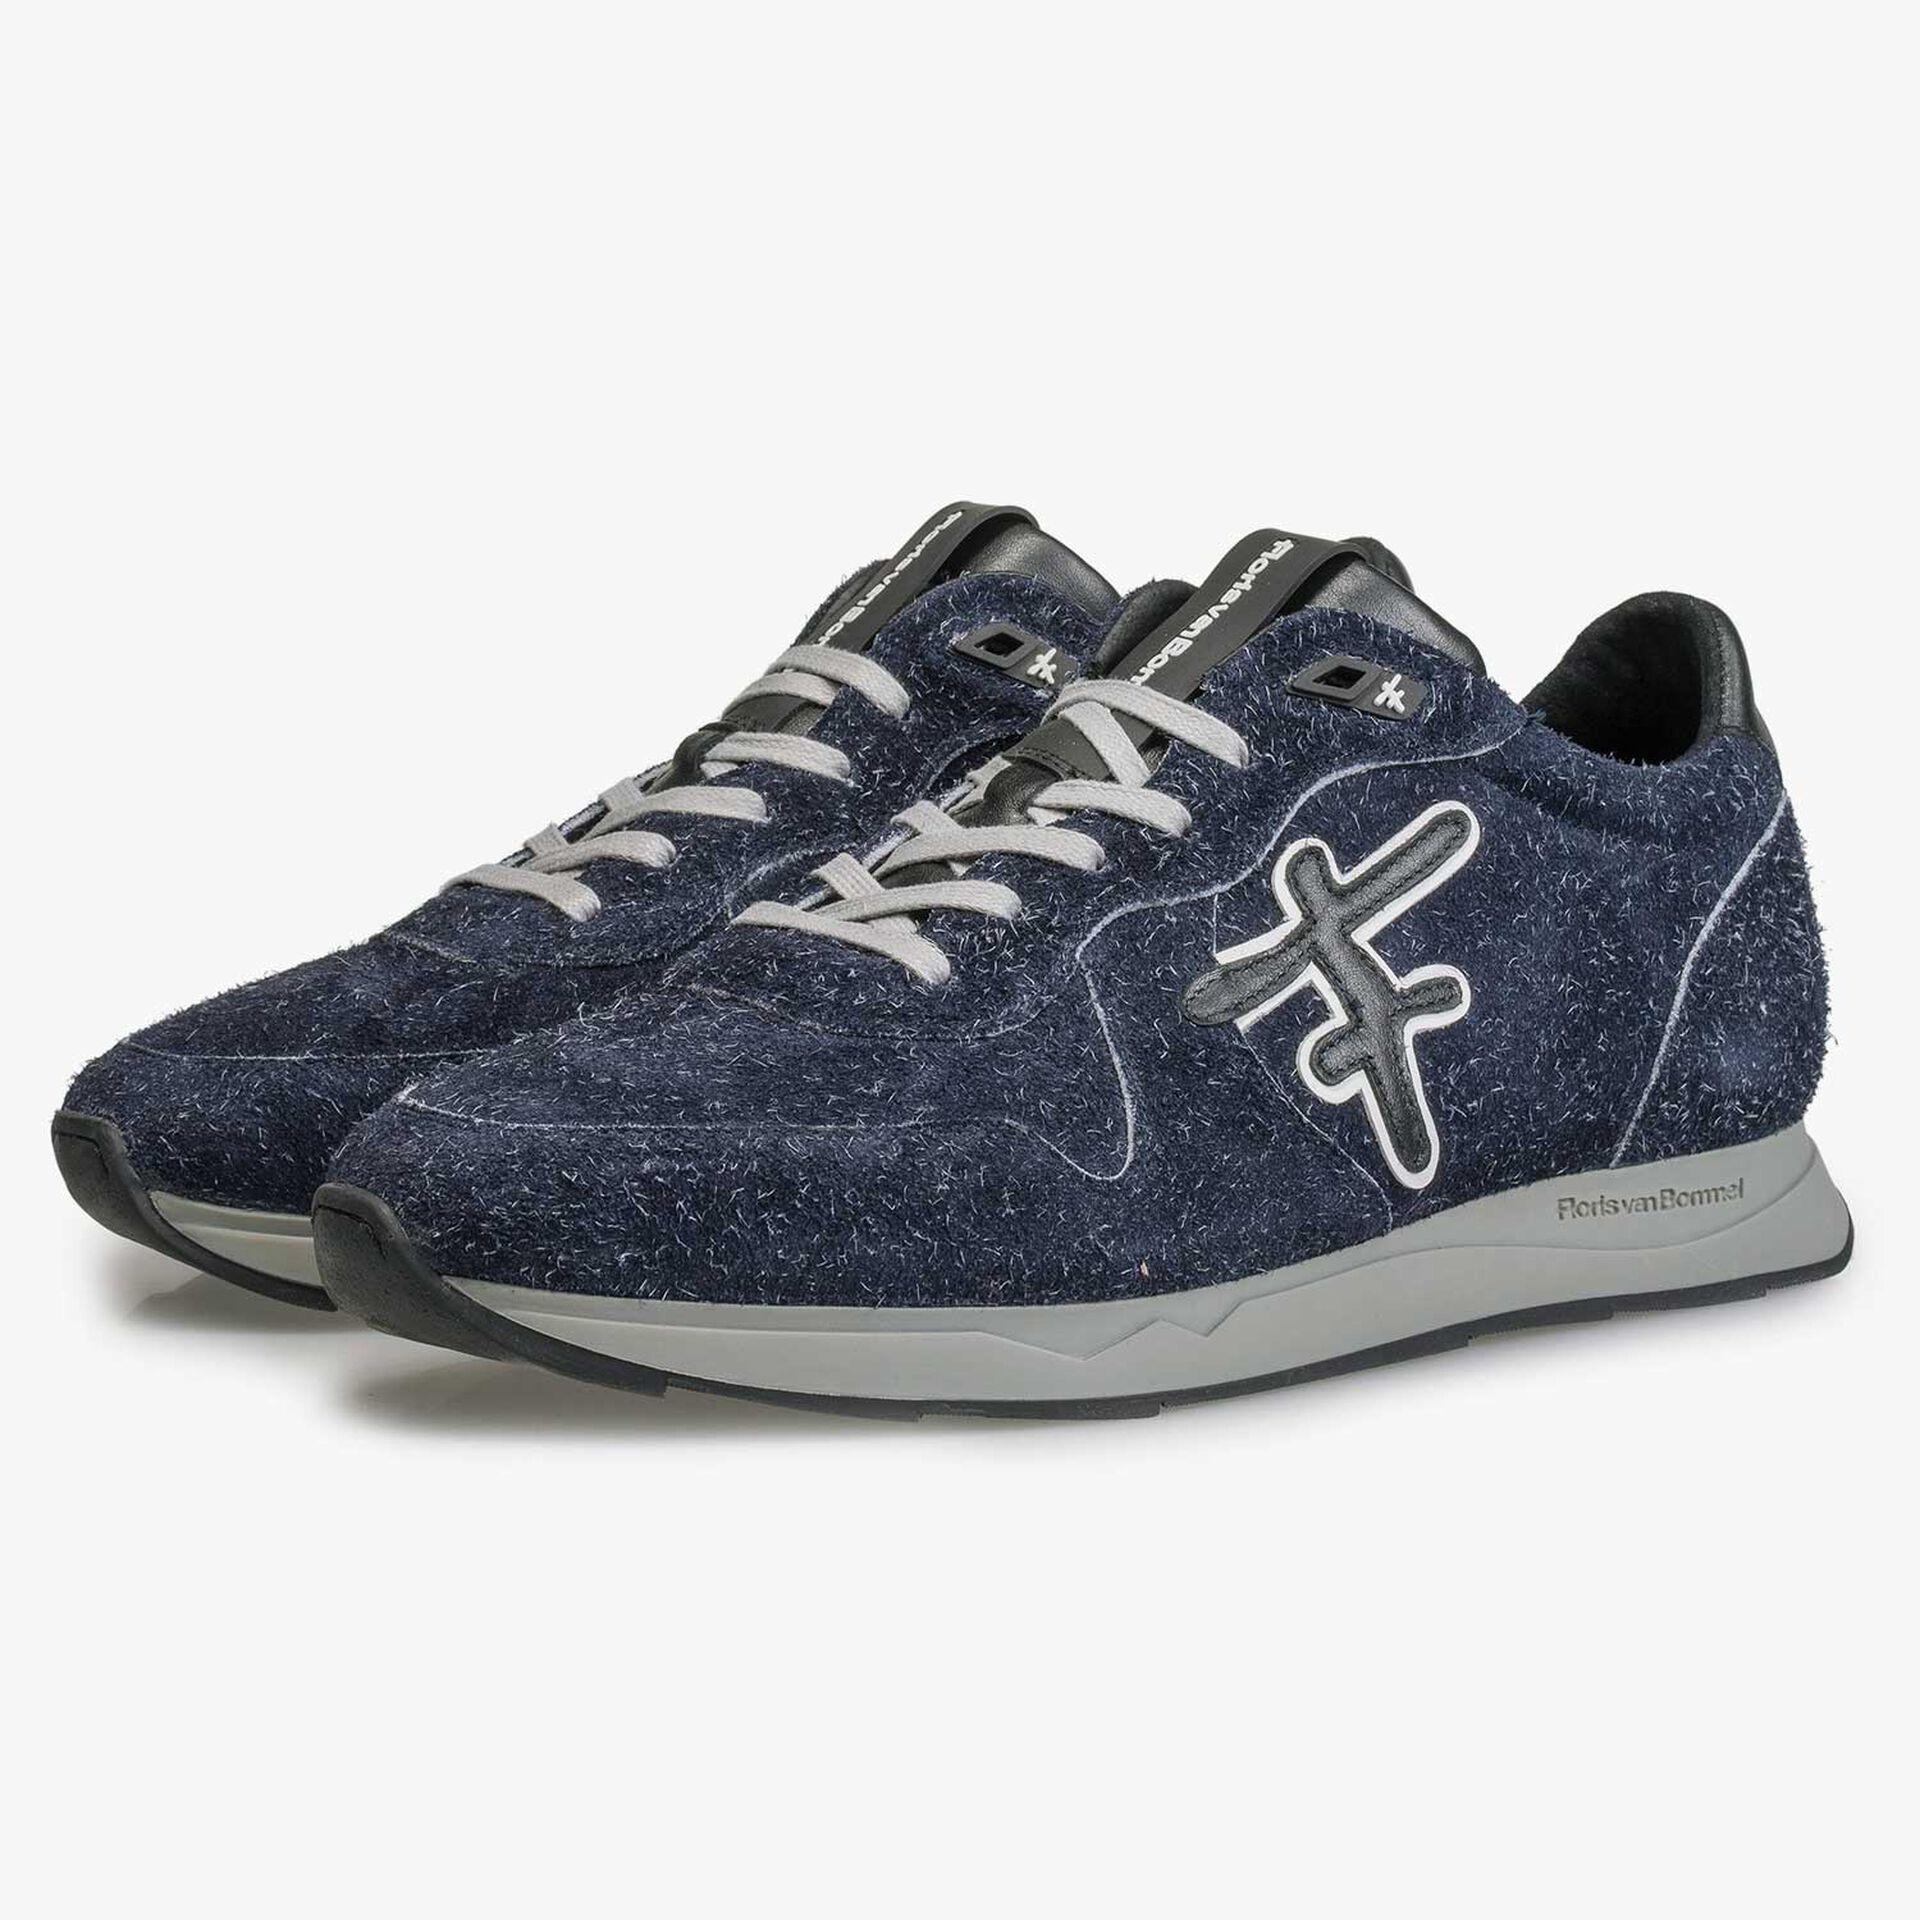 Sneaker aus blauem, rauhaarigem Wildleder